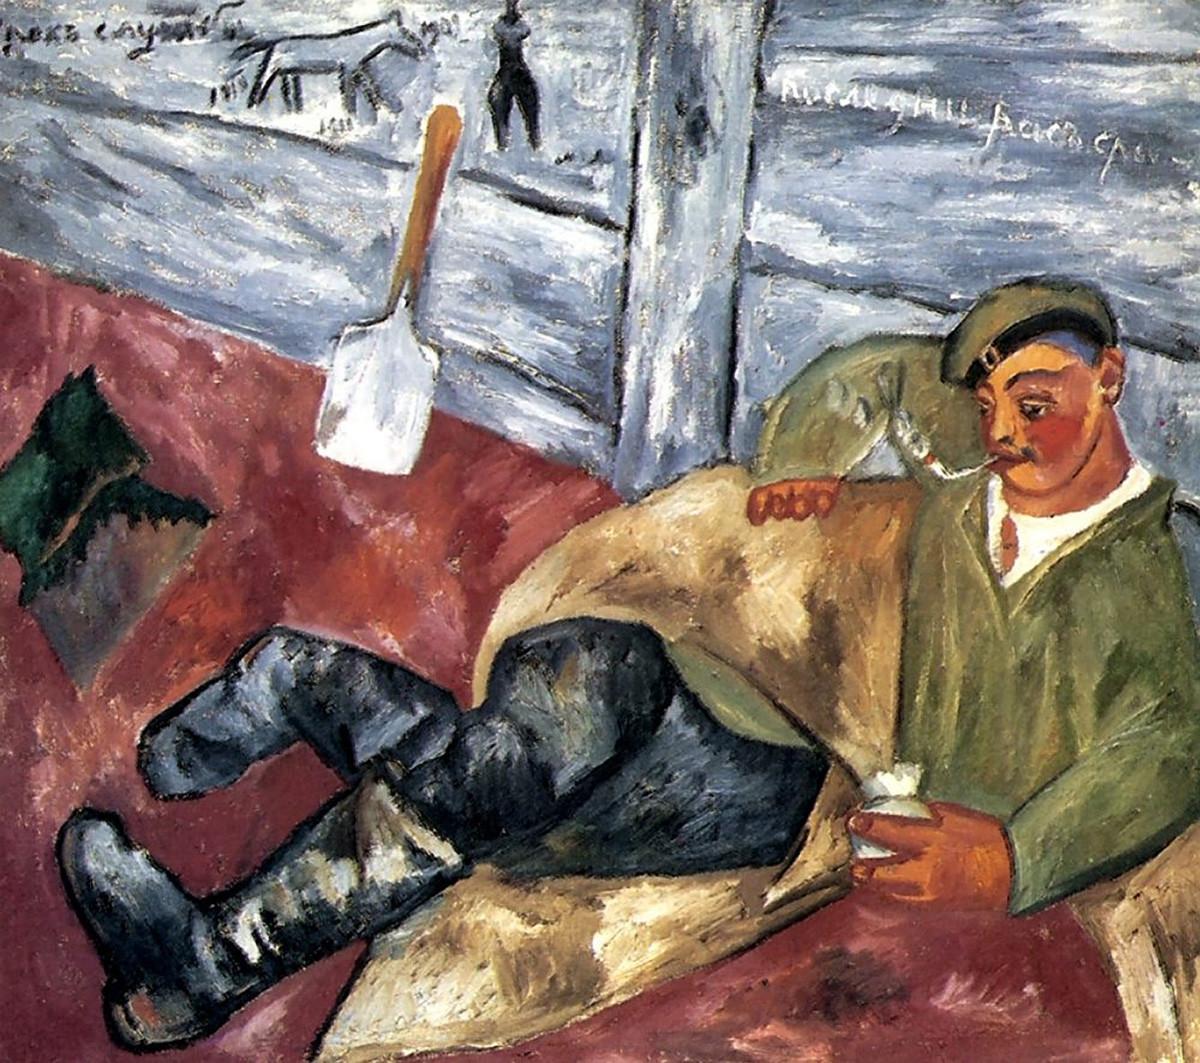 """Одмор на војник"", Михаил Ларионов, 1911."